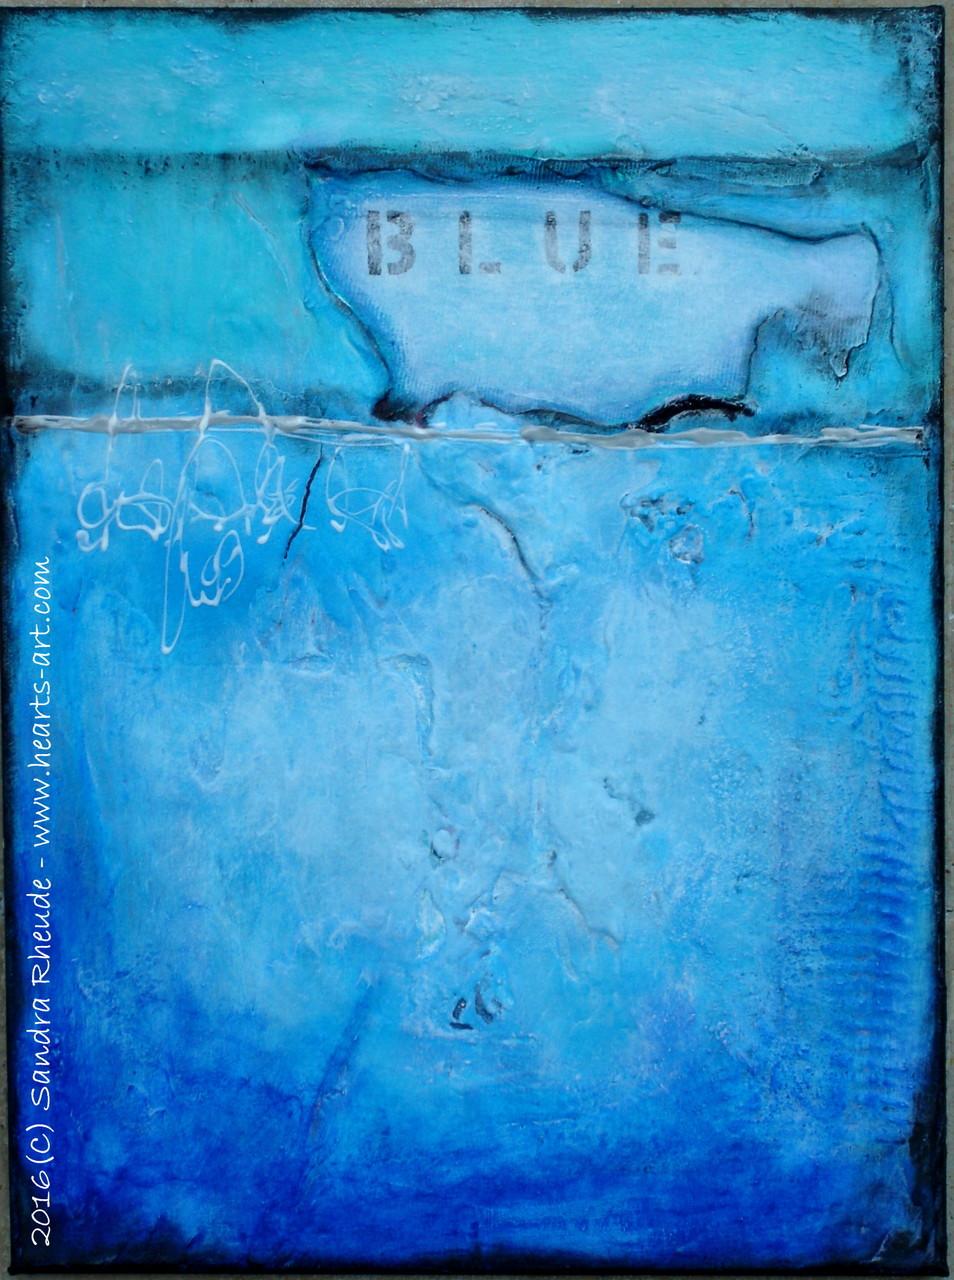 'Blue' -  2016/13 - Acryl/MixedMedia auf Leinwand - 30 x 40 cm - € 220